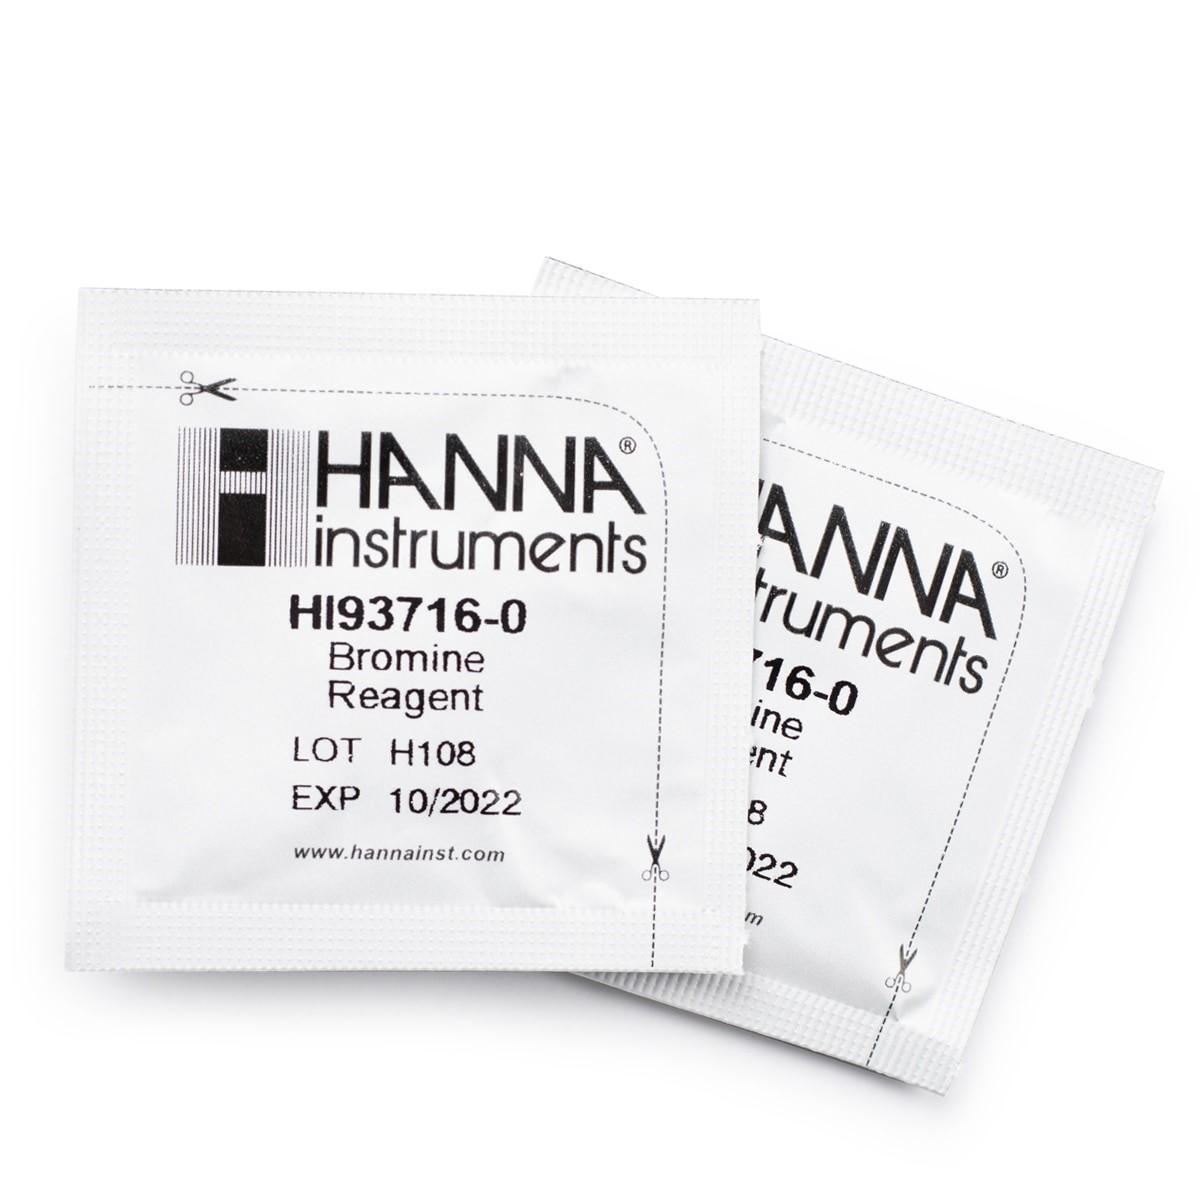 HI93716-01 Bromine Reagents (100 tests)